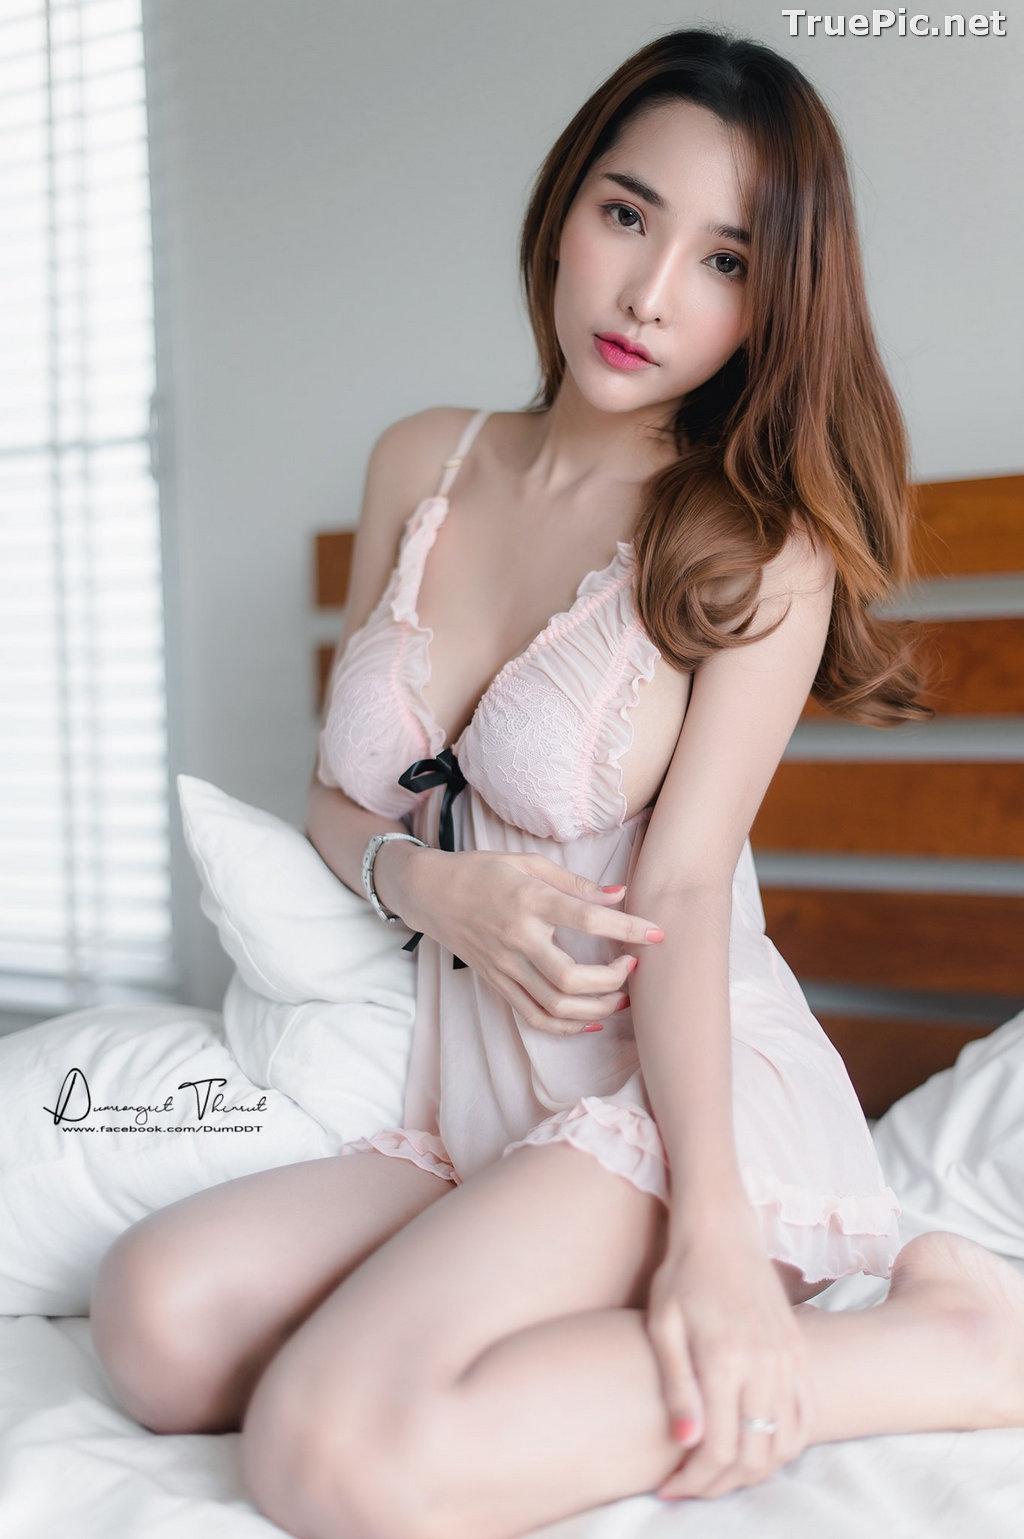 Image Thailand Model - Thanyalak Phantan - Cherry Pink Love - TruePic.net - Picture-1